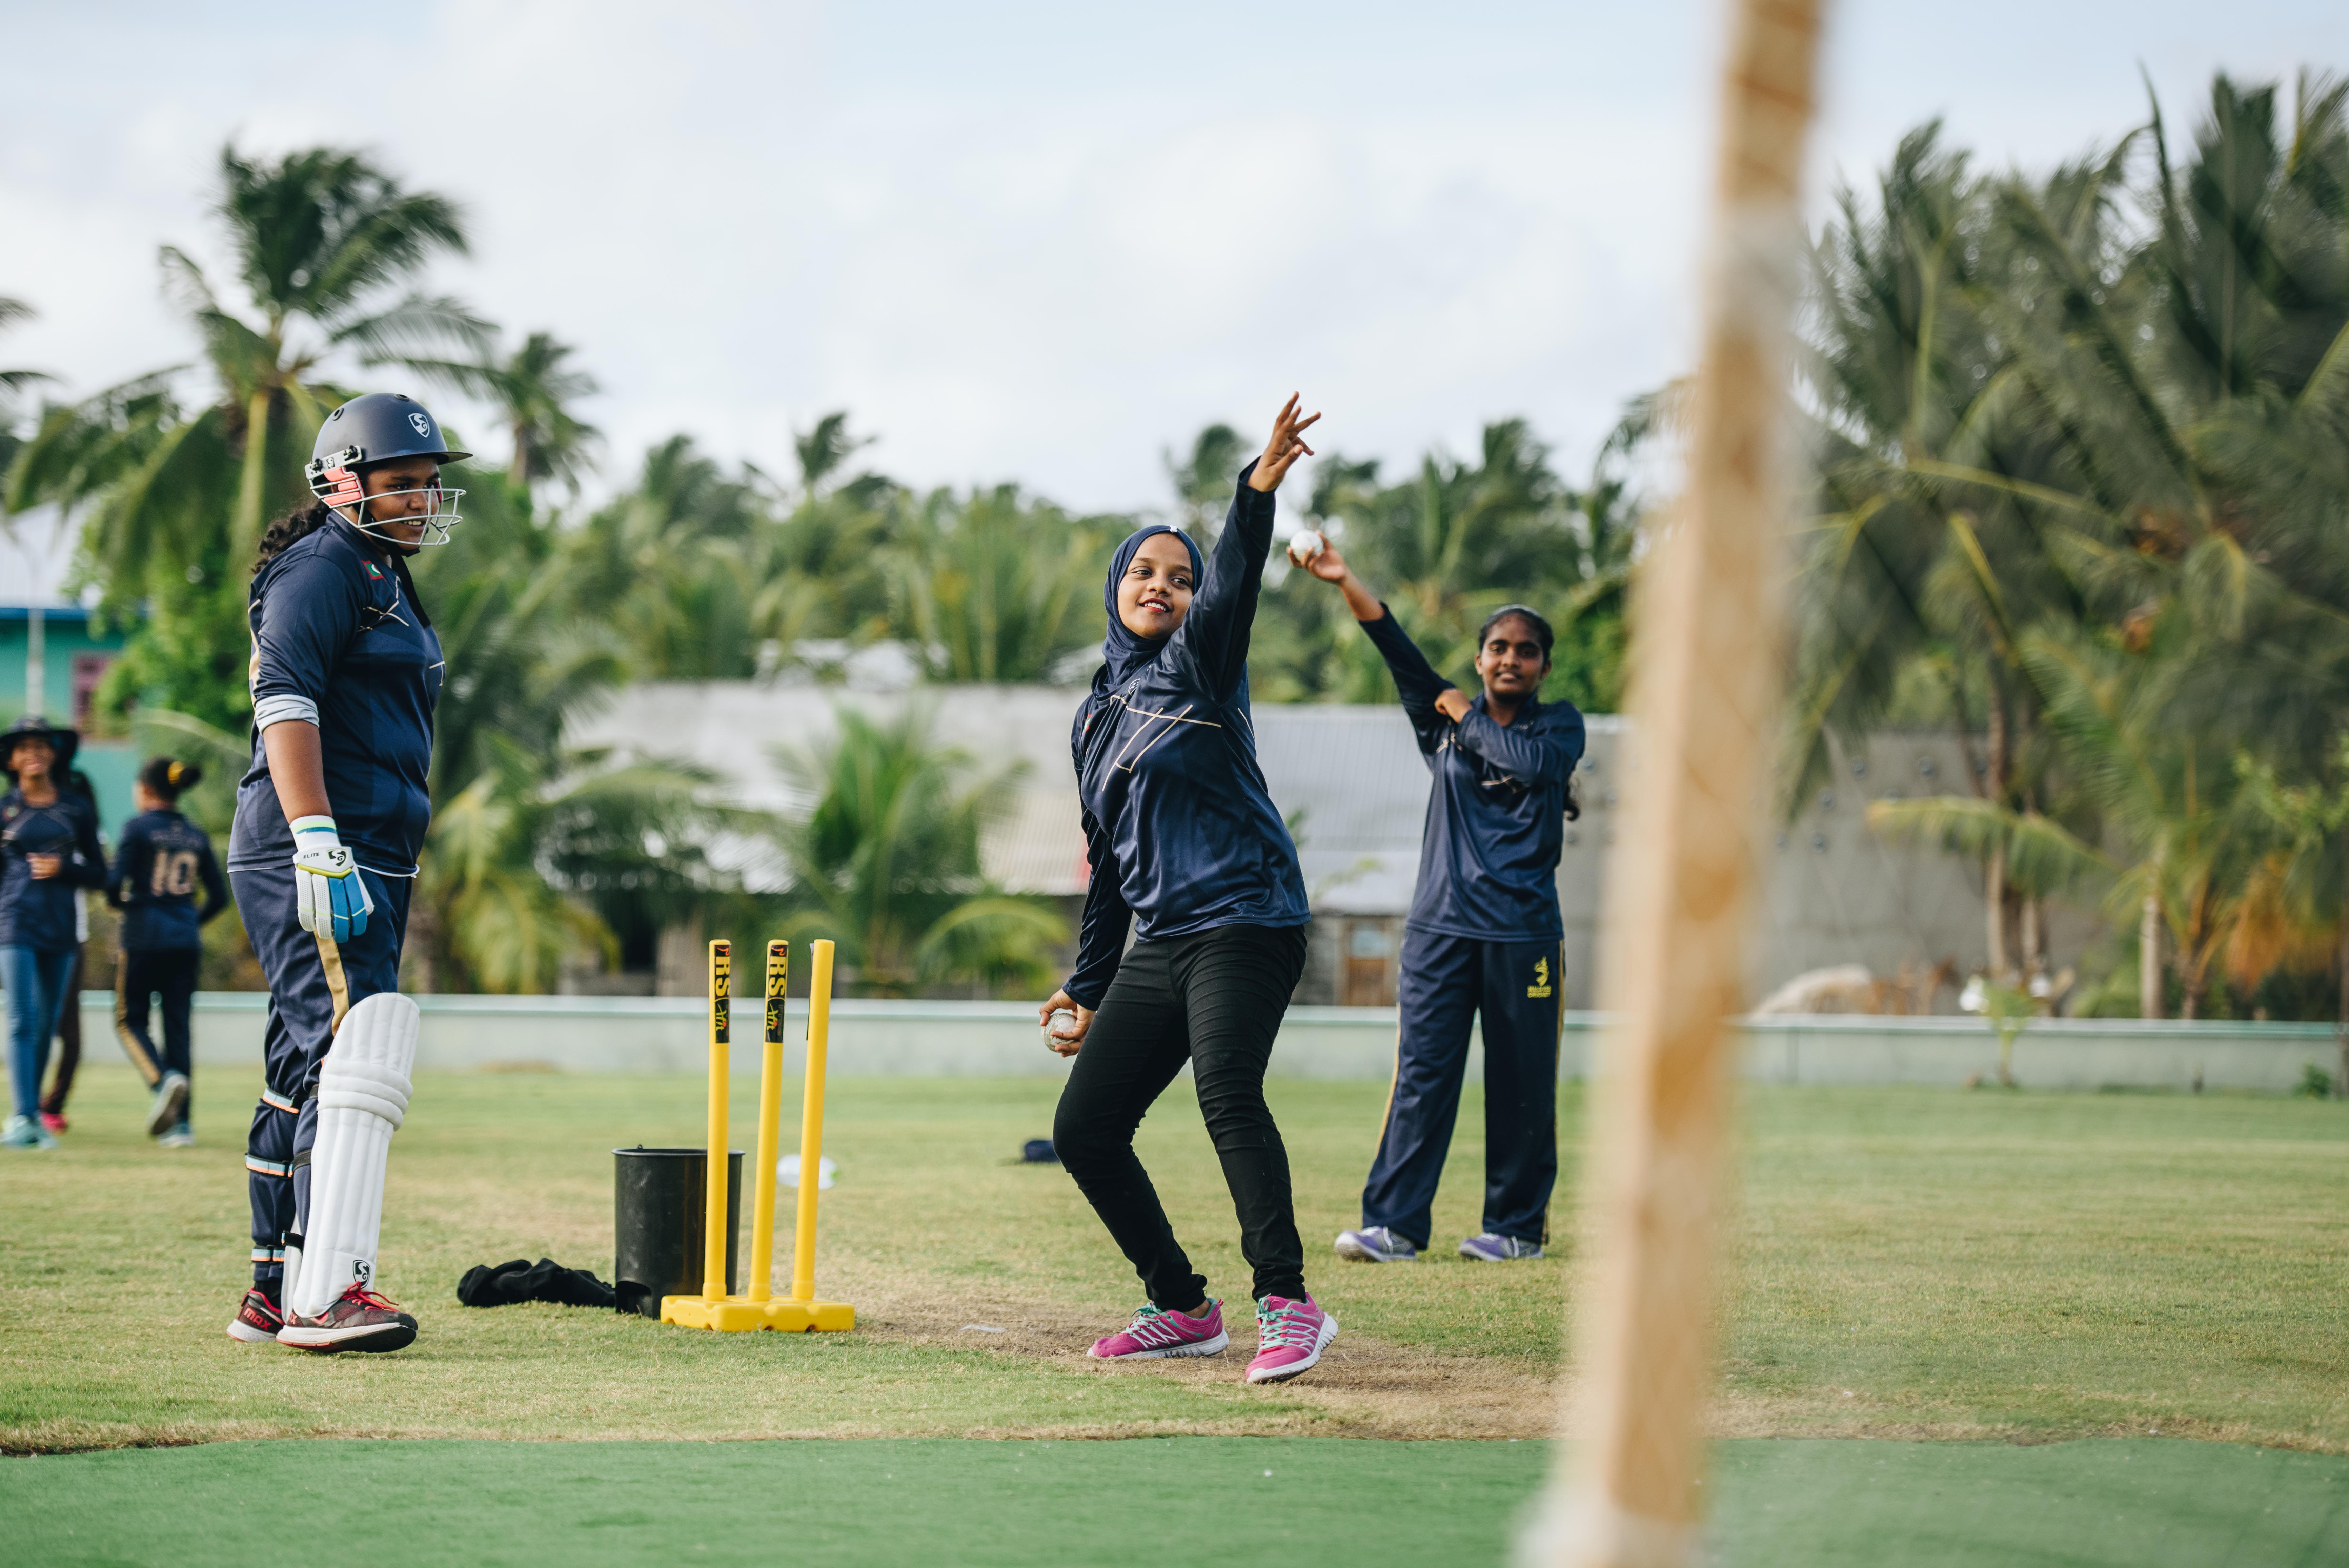 FVM cricket